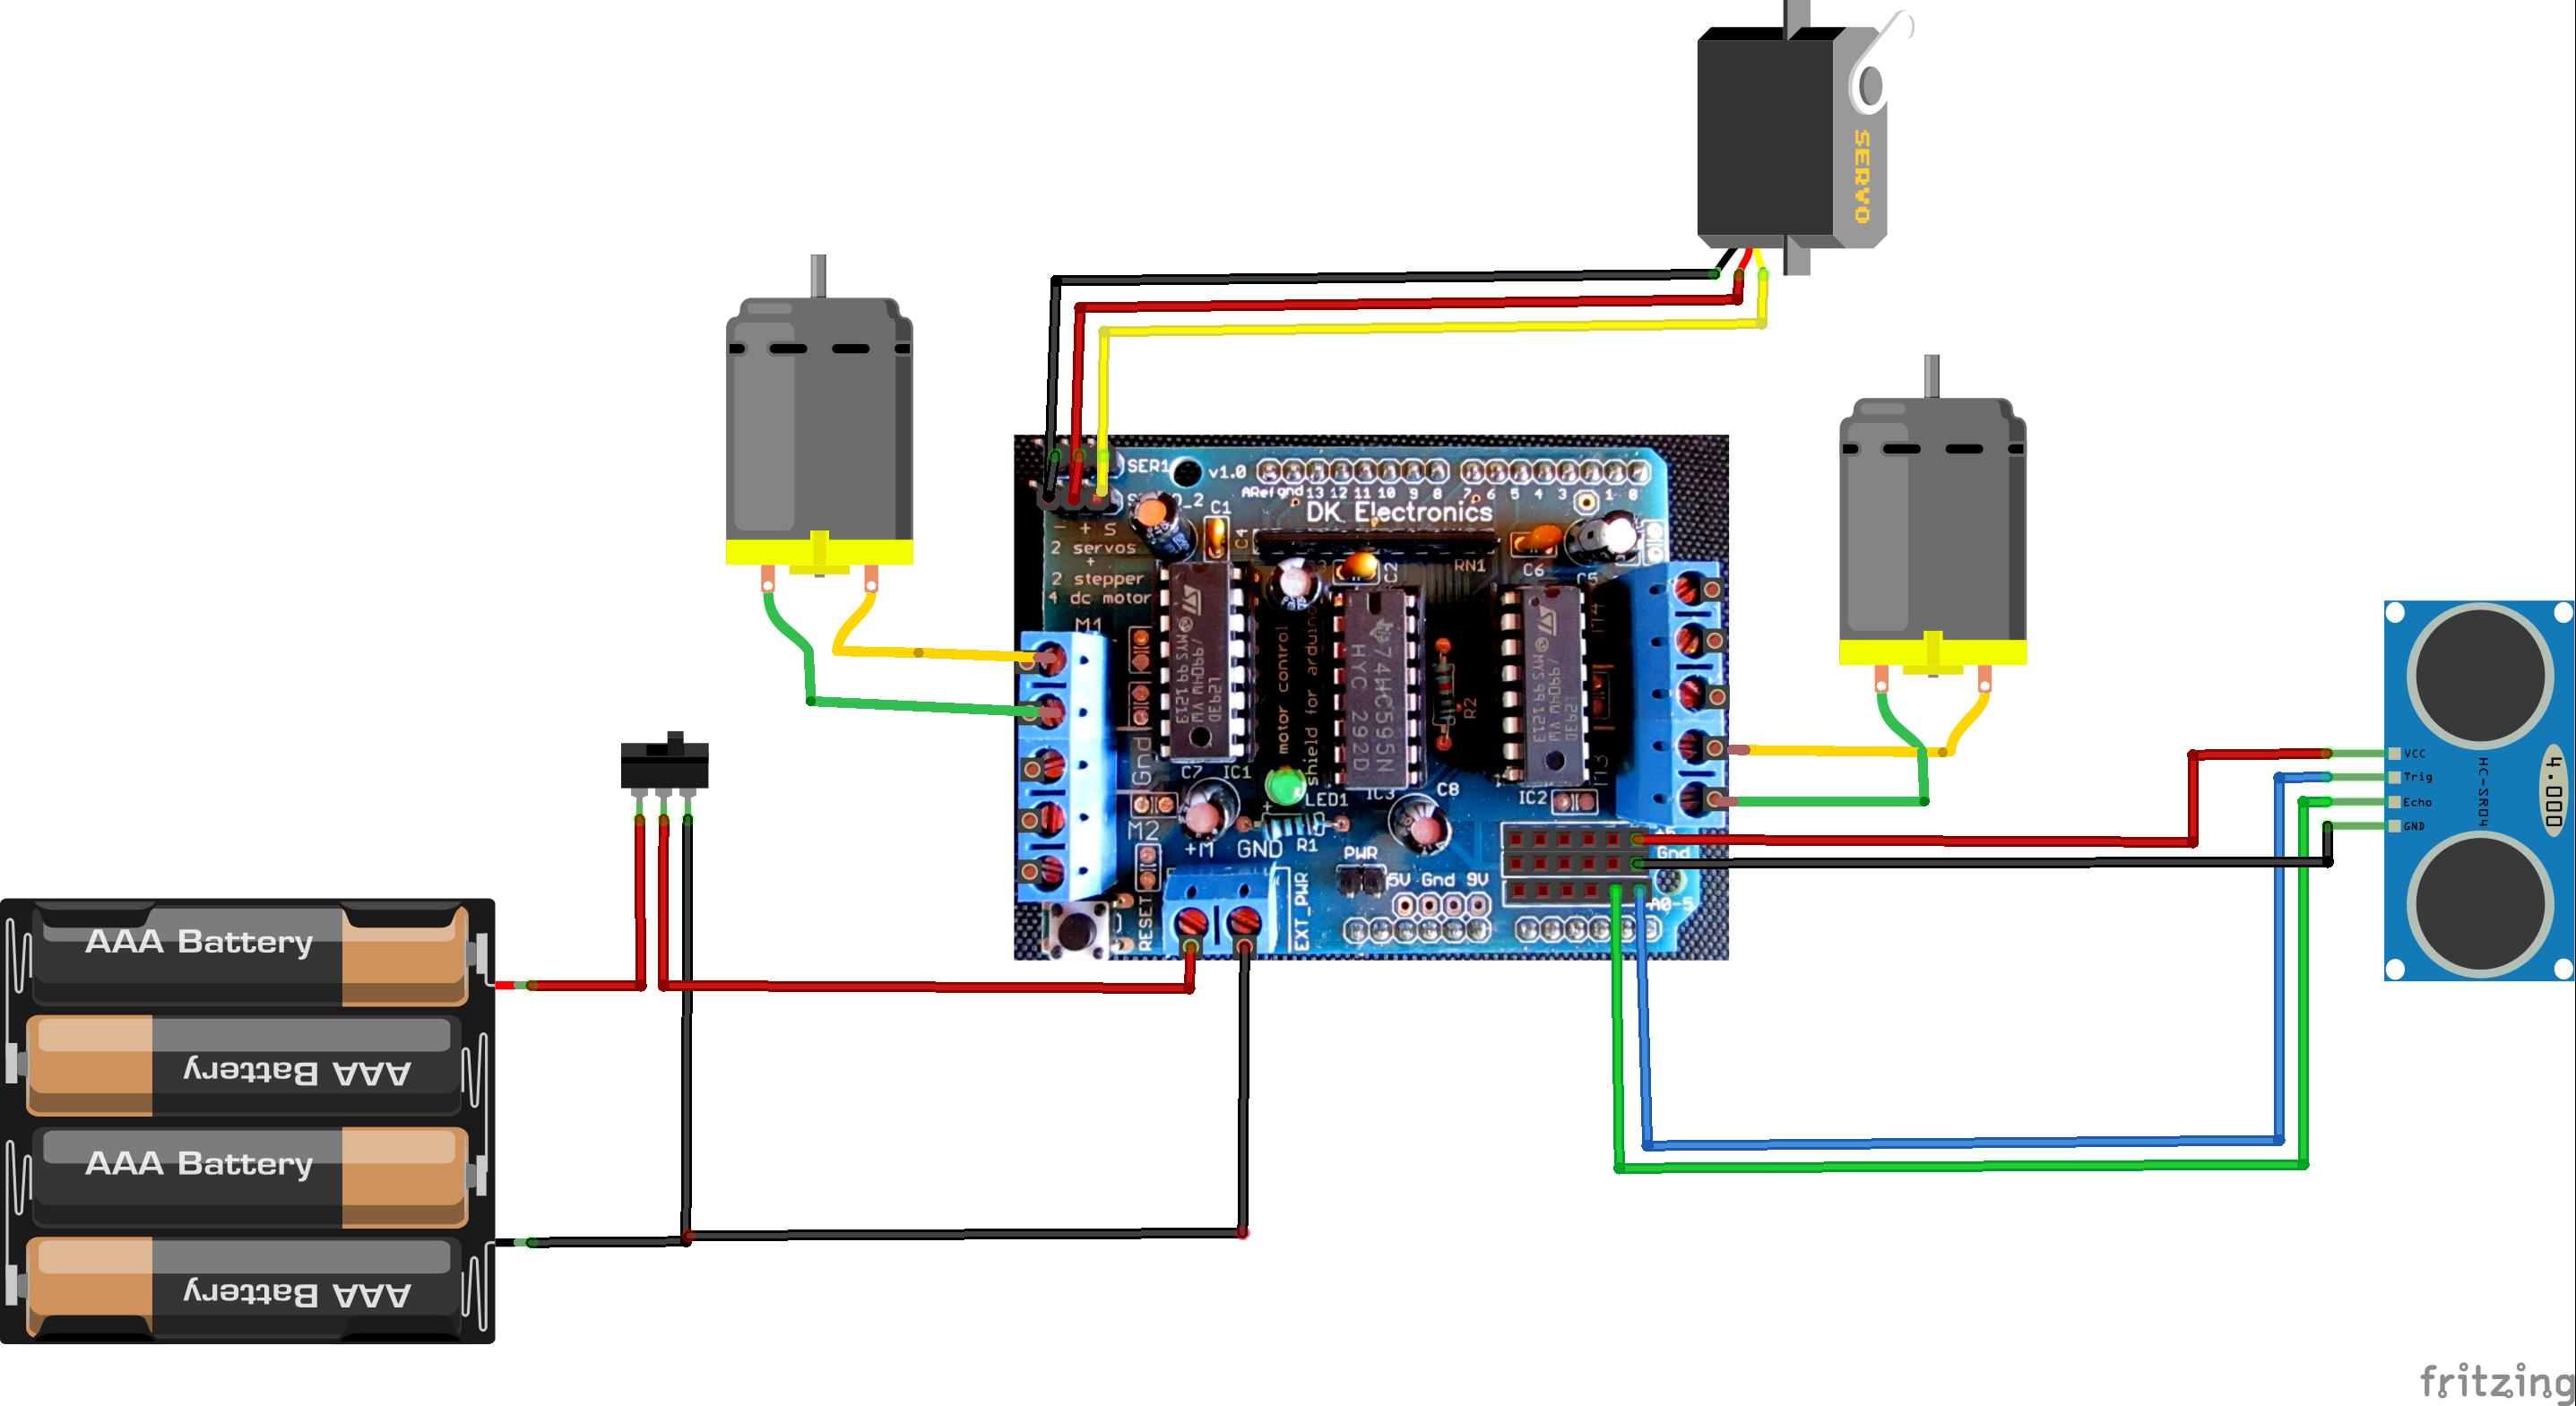 Arduino Robot - An easy DIY project - educ8s tv - Watch Learn Build